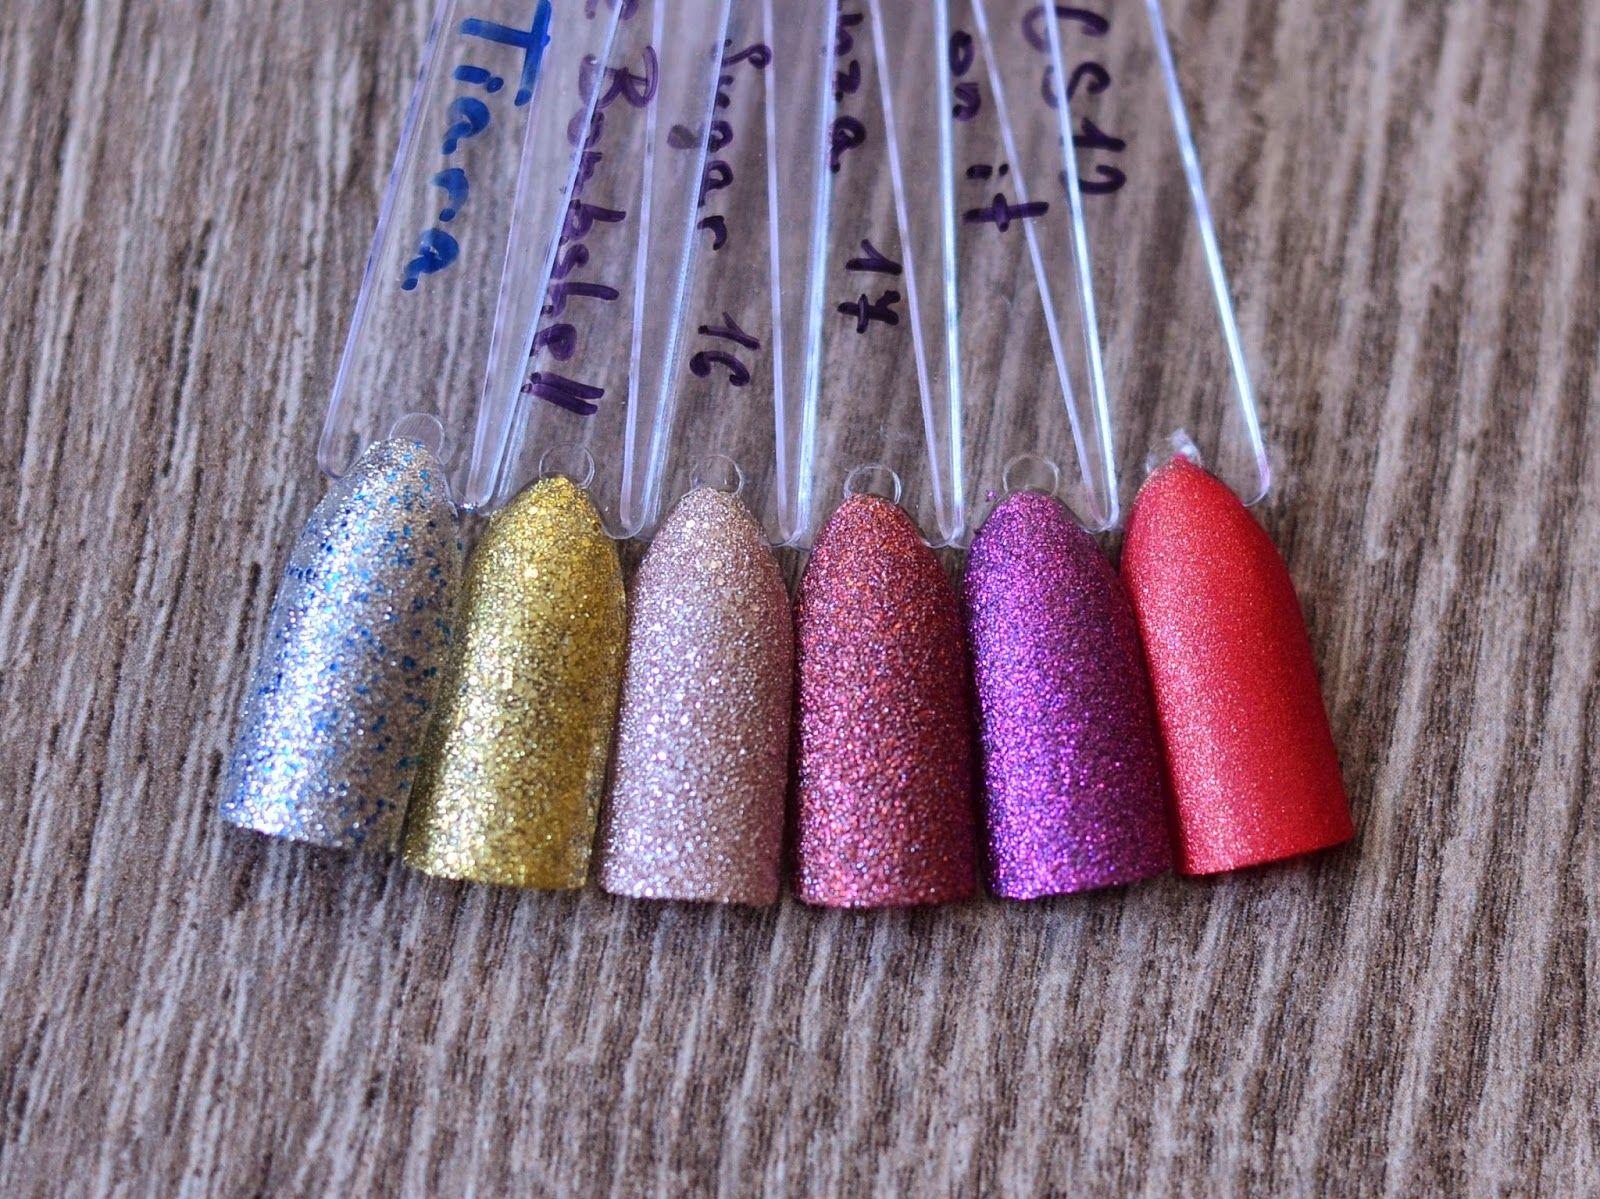 glitter and sand colours nail polish display, storage, colors 50 PCS ...